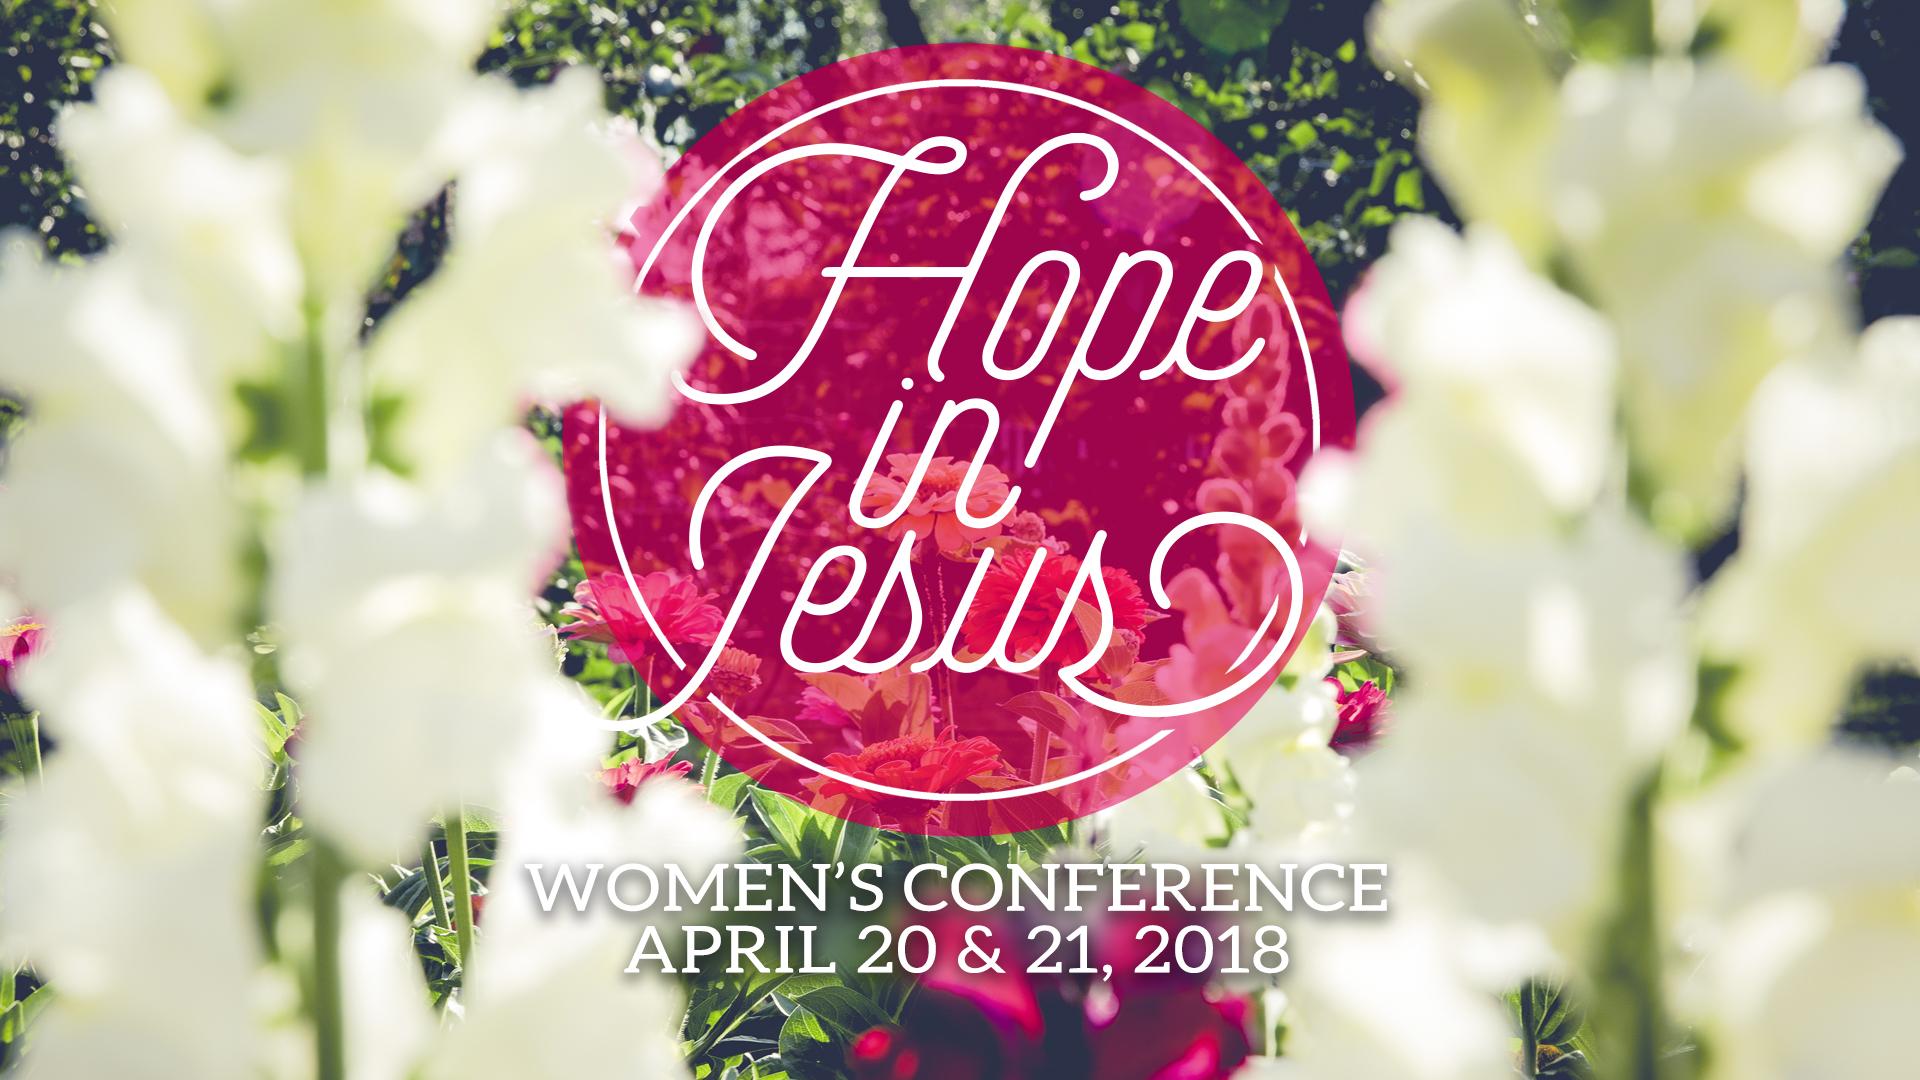 Womensconference2018 va